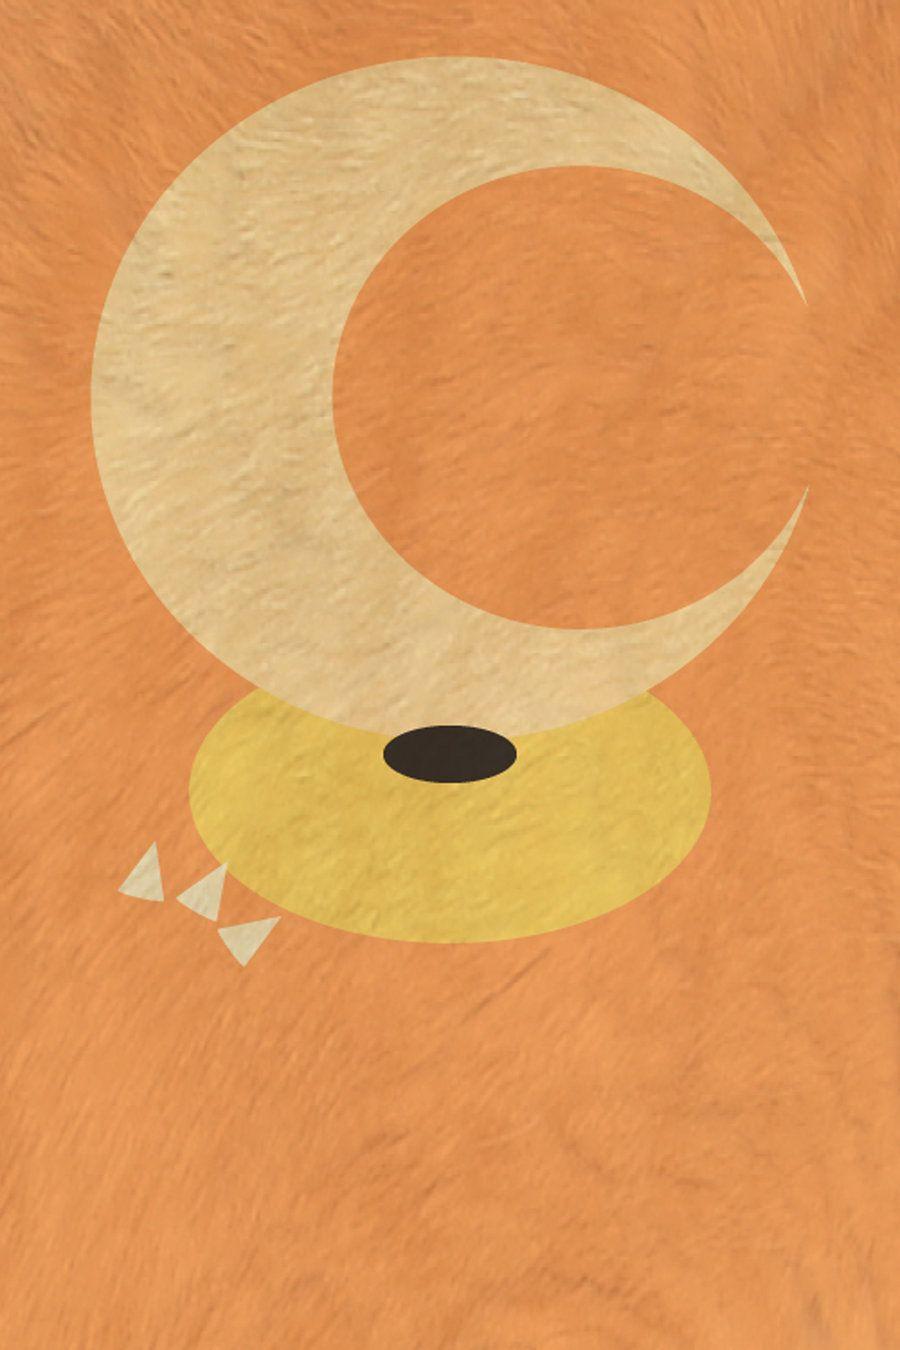 Teddiursa by Jehuty23 | Pokemon Posters | Pinterest | deviantART …